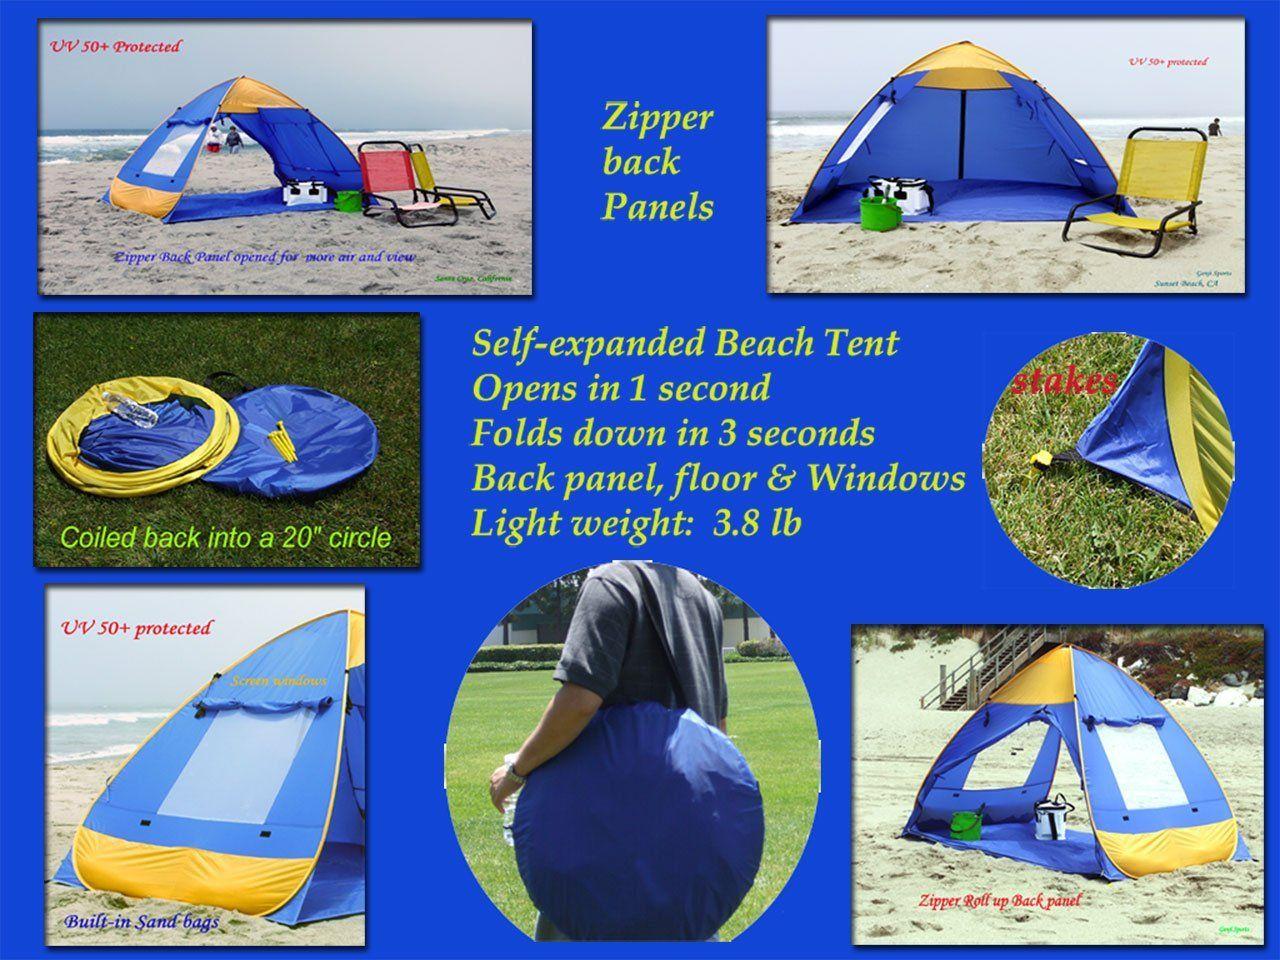 Amazon.com  Genji Sports Pop Up Family Beach Tent And Beach Sunshelter  Family  sc 1 st  Pinterest & Amazon.com : Genji Sports Pop Up Family Beach Tent And Beach ...